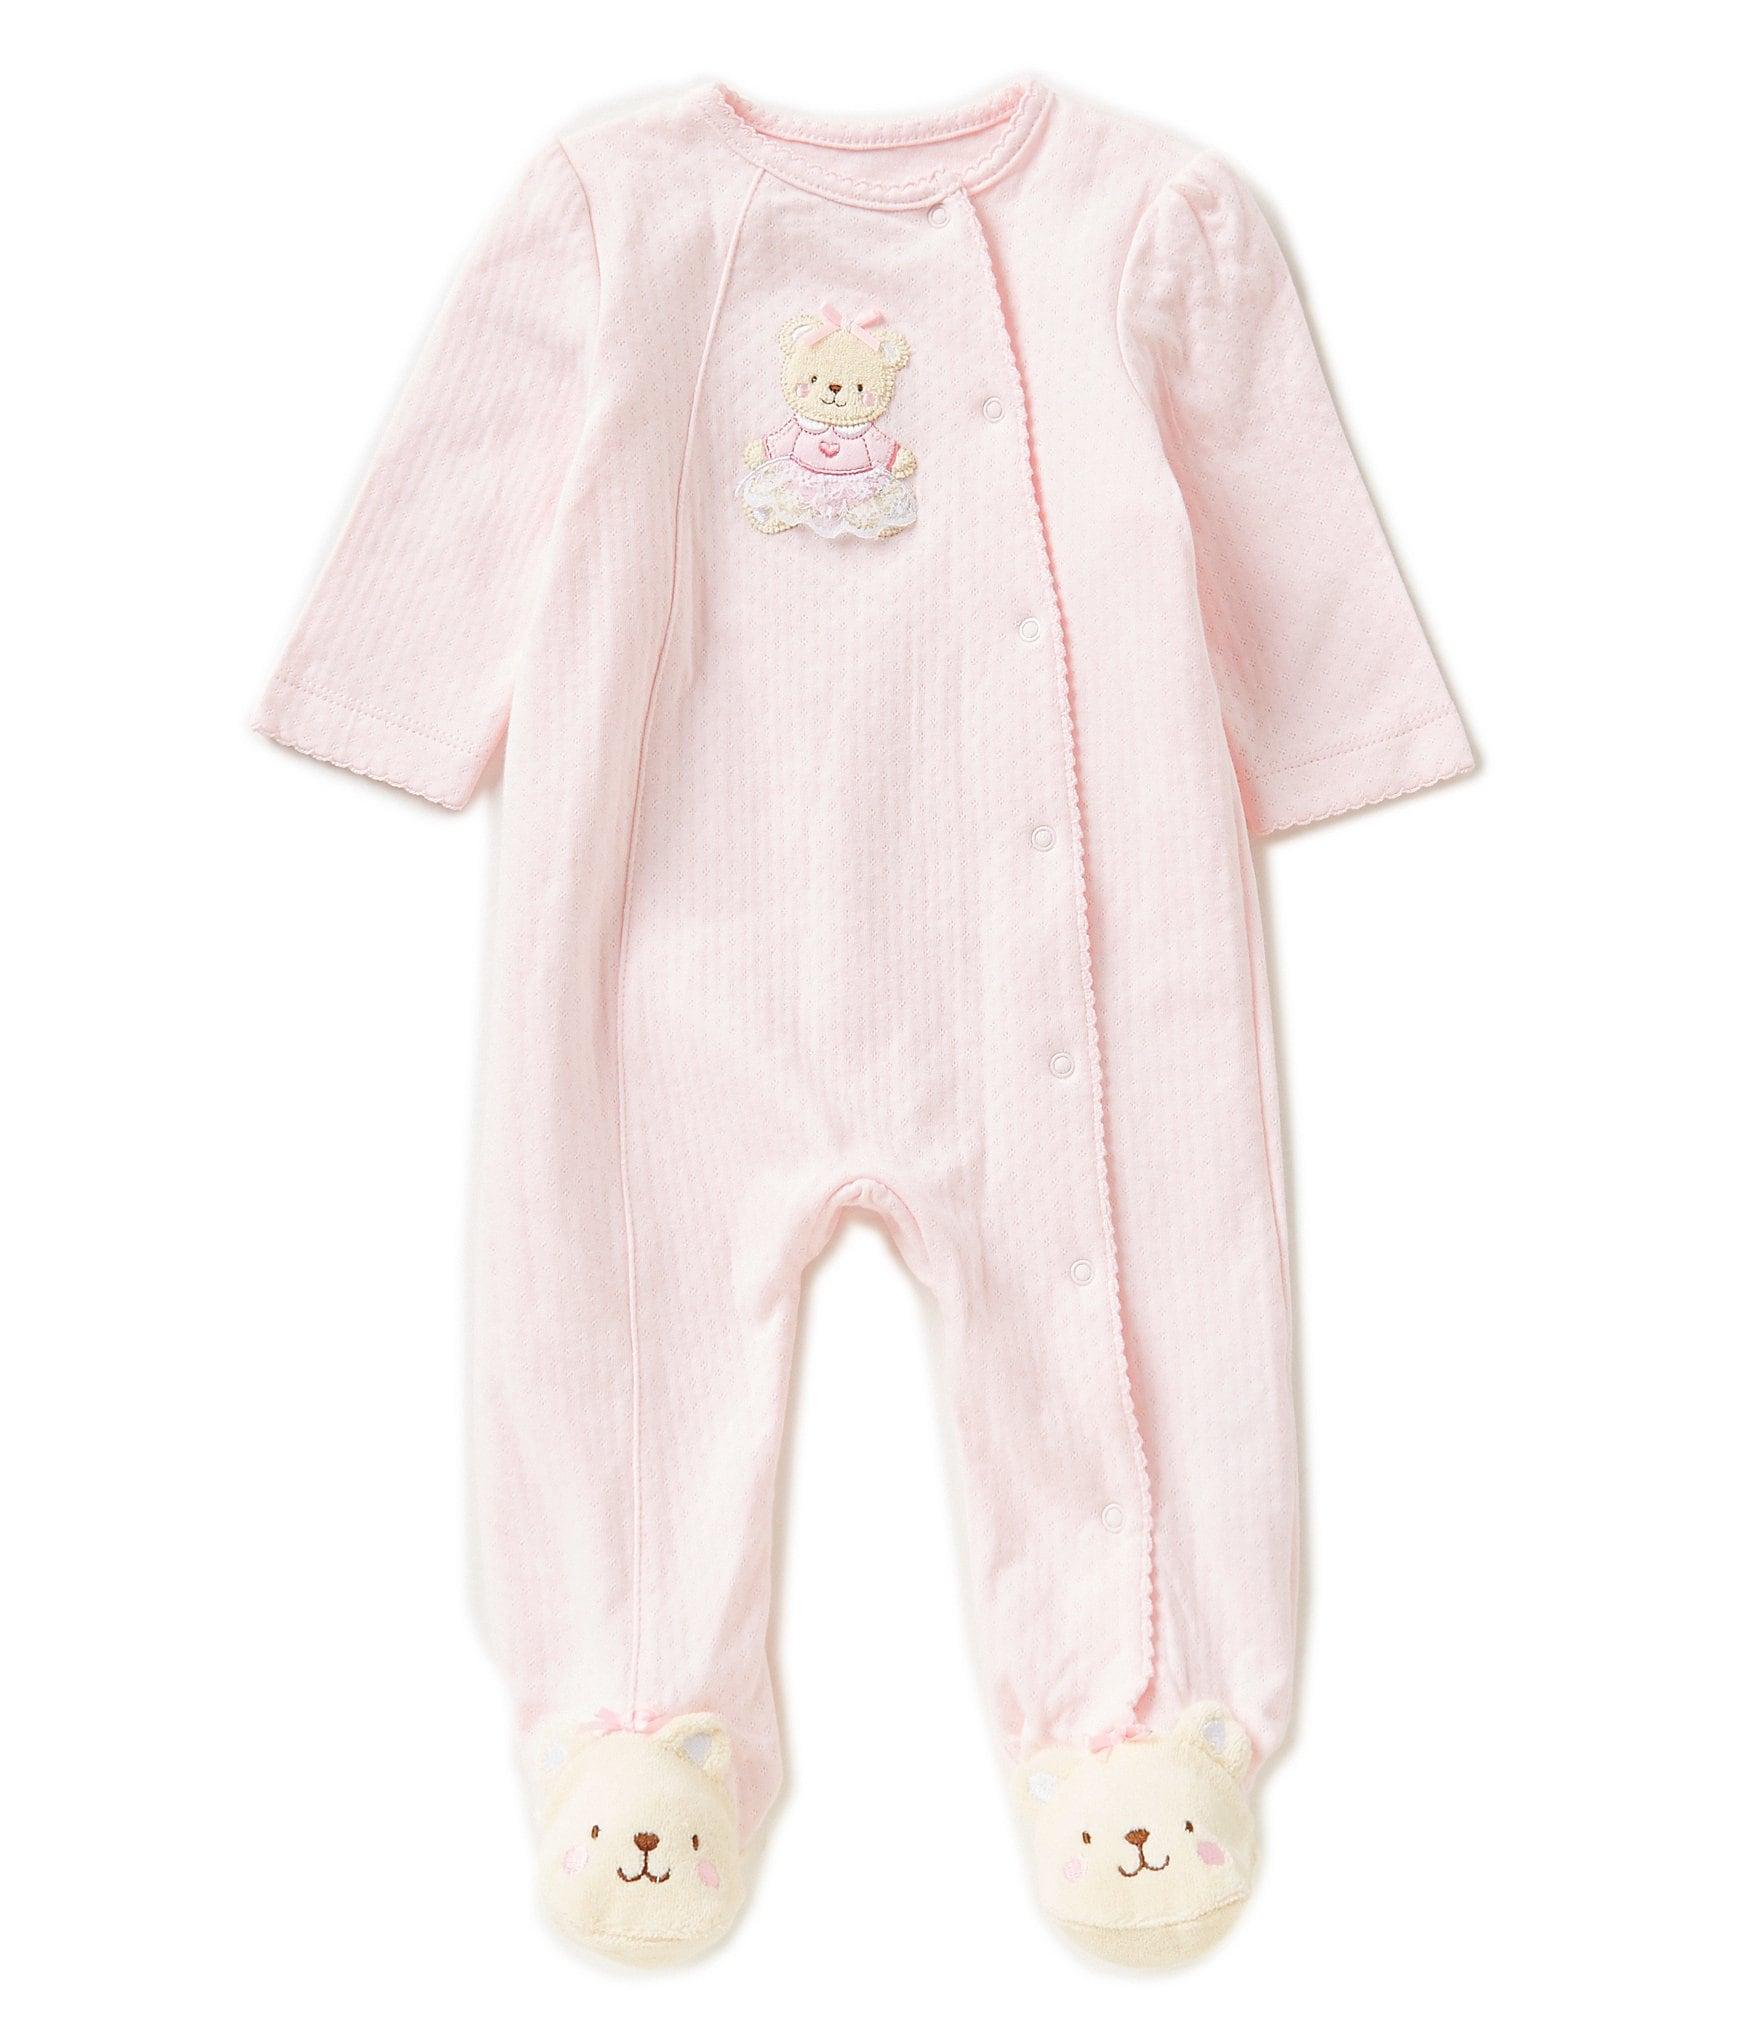 e498e20bc Little Me Baby Girl Pajamas   Sleepwear